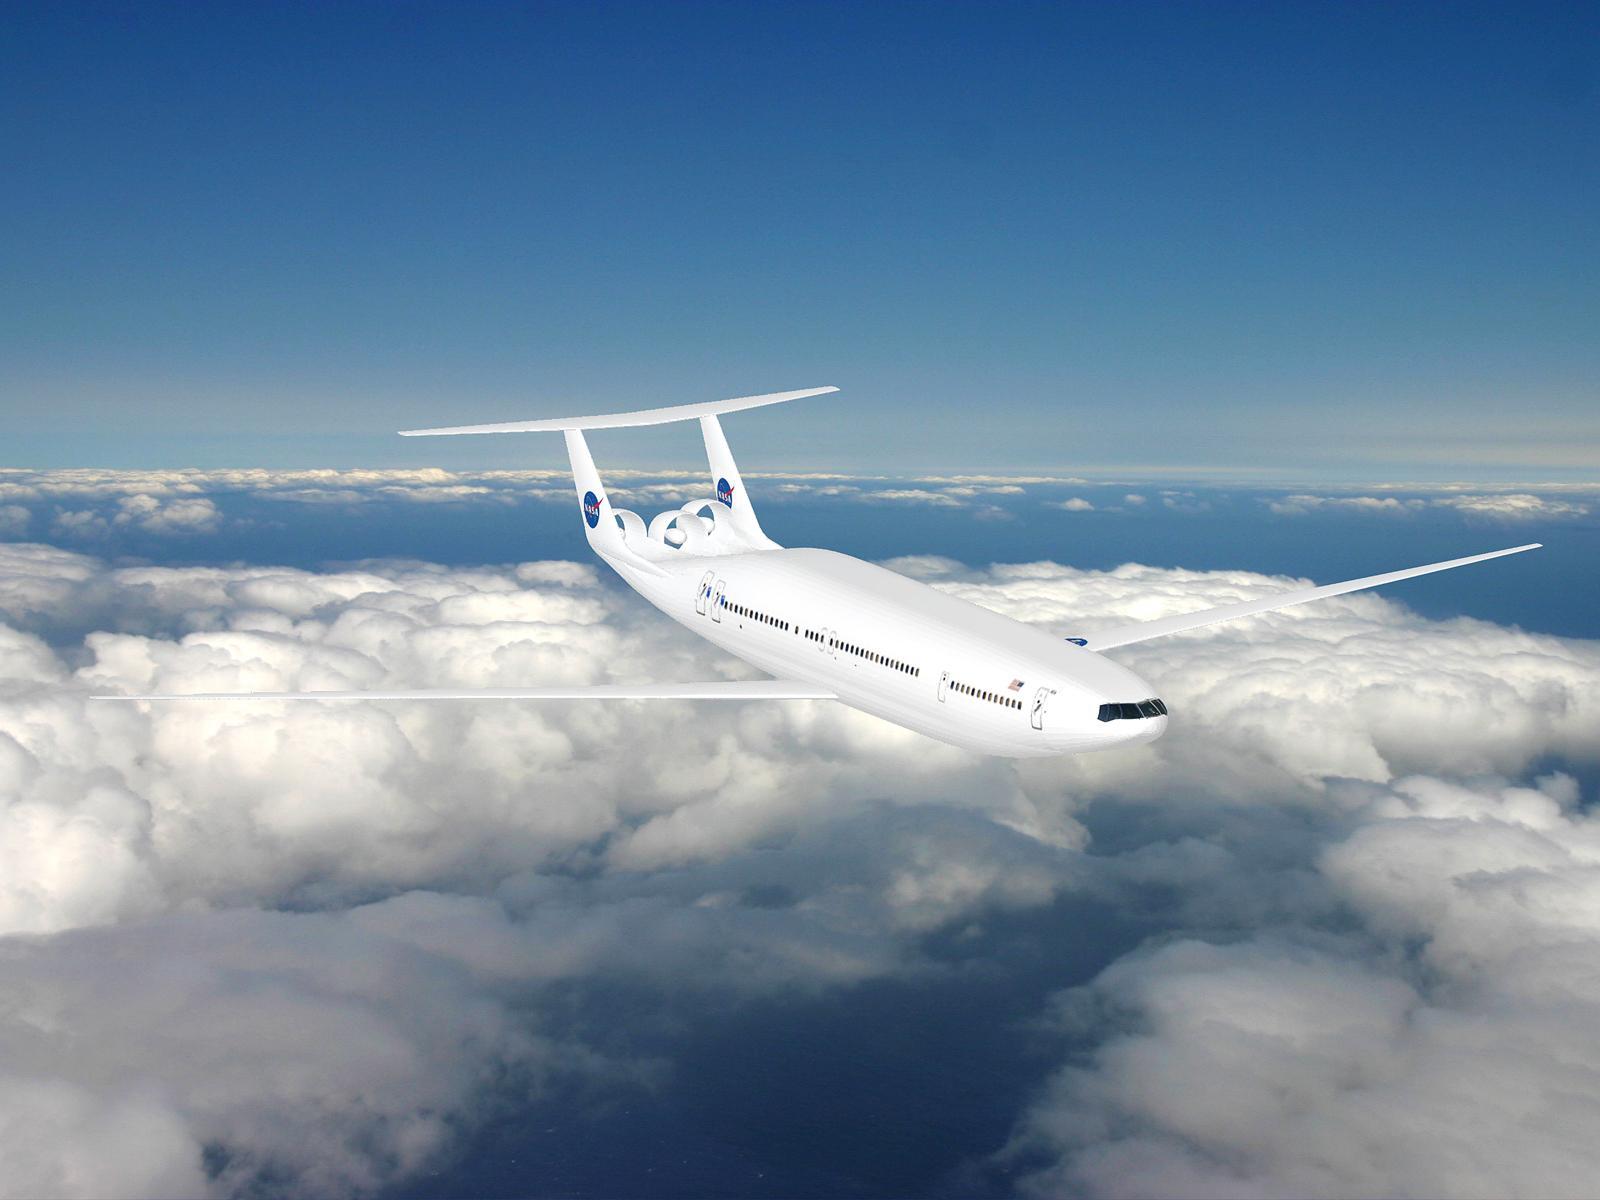 The Double Bubble D8 in Flight